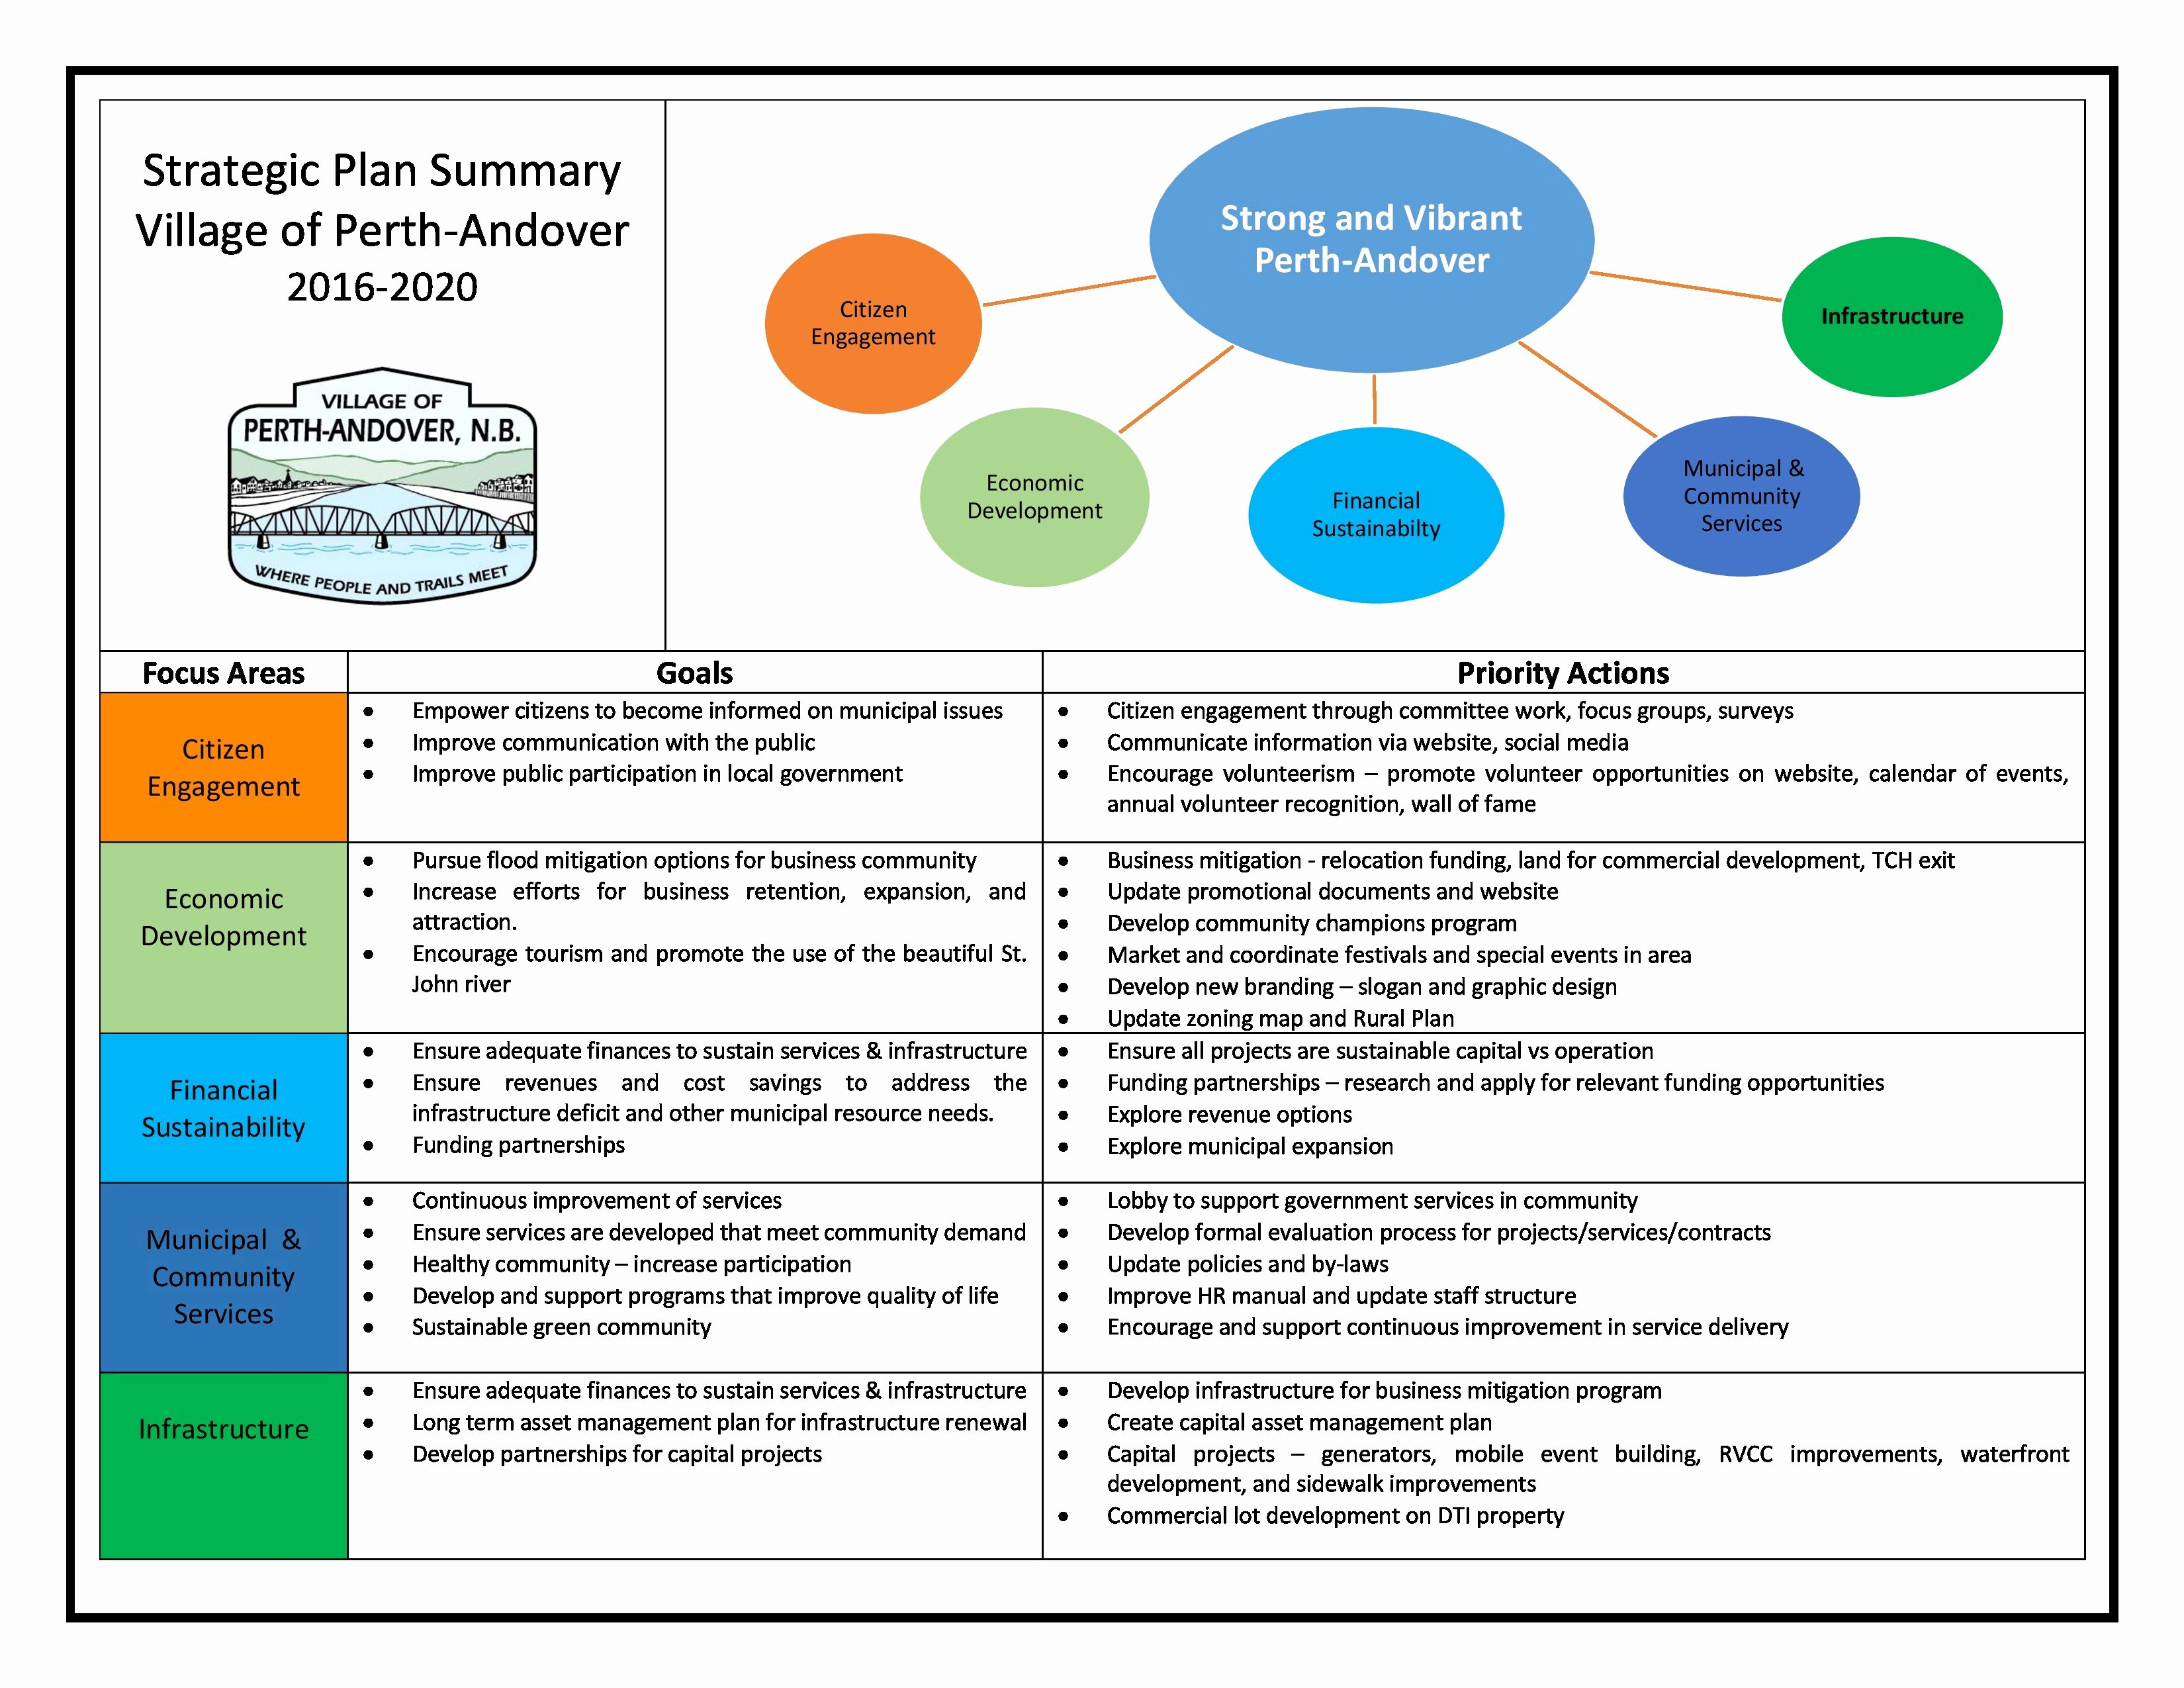 Diversity Strategic Plan Template Best Of Strategic Plan 2016 2020